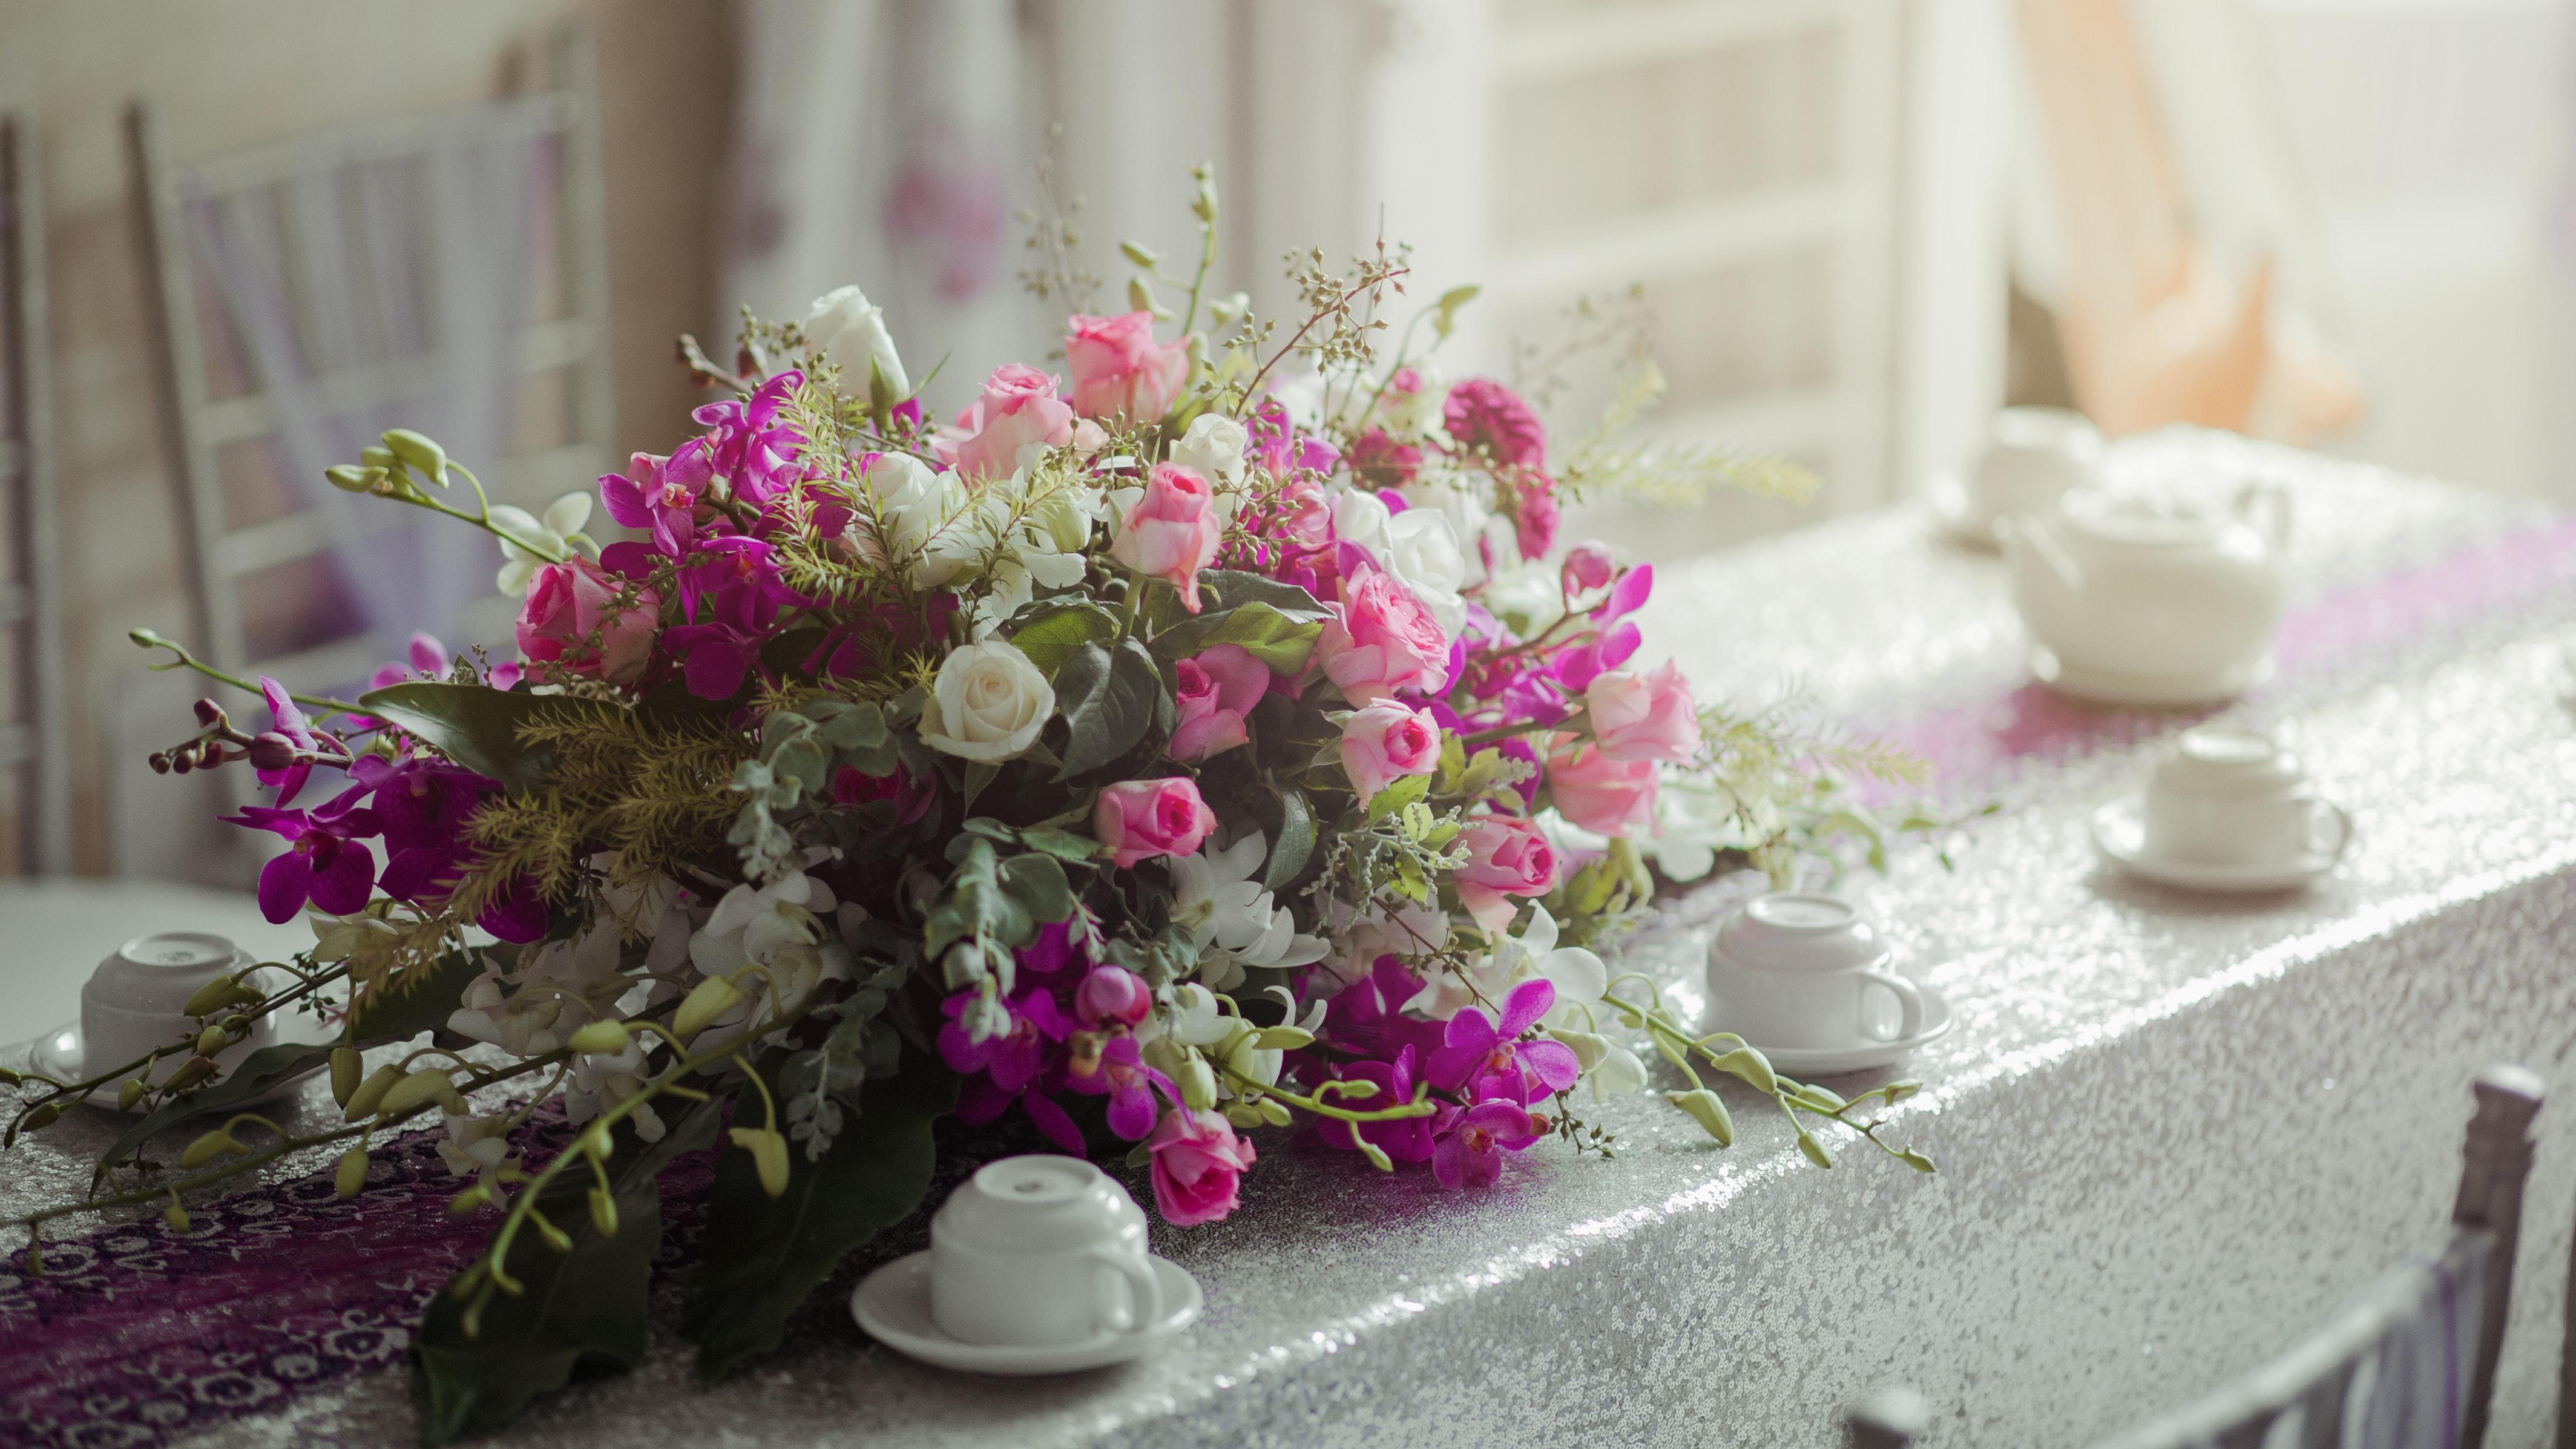 Fotos Gratis Hermosa Florecer Floreciente Difuminar